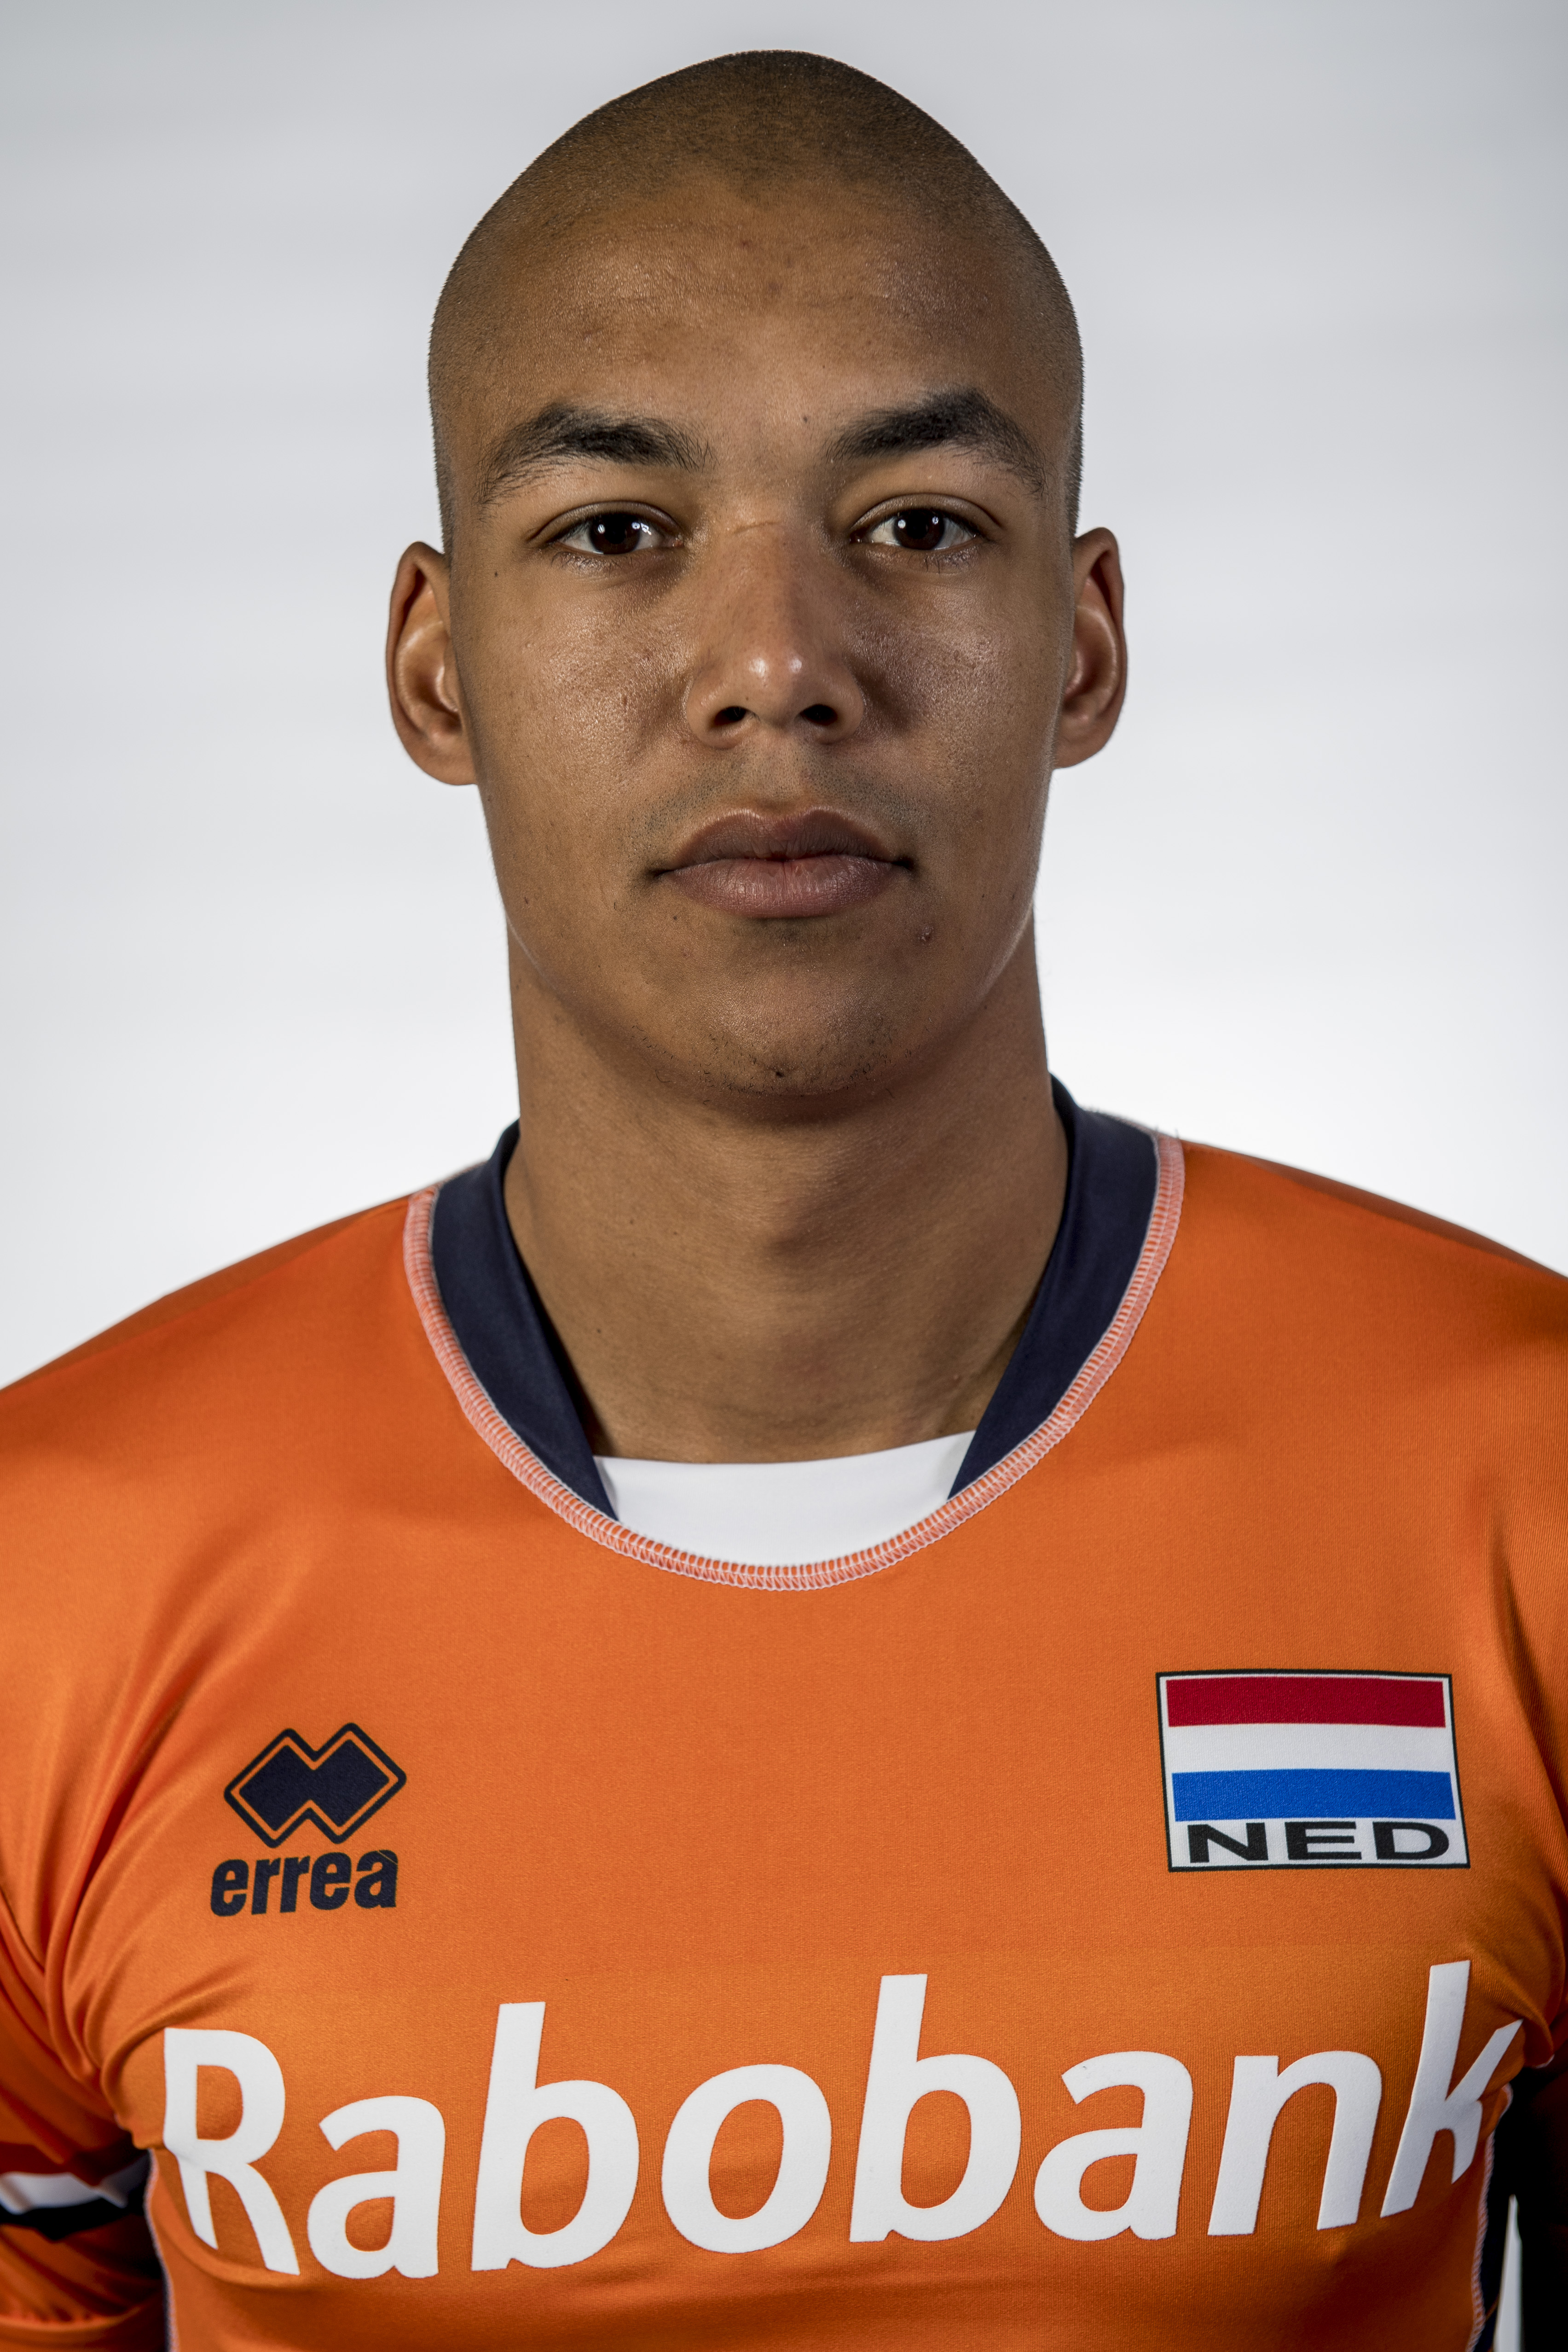 Nimir Abdel-Aziz